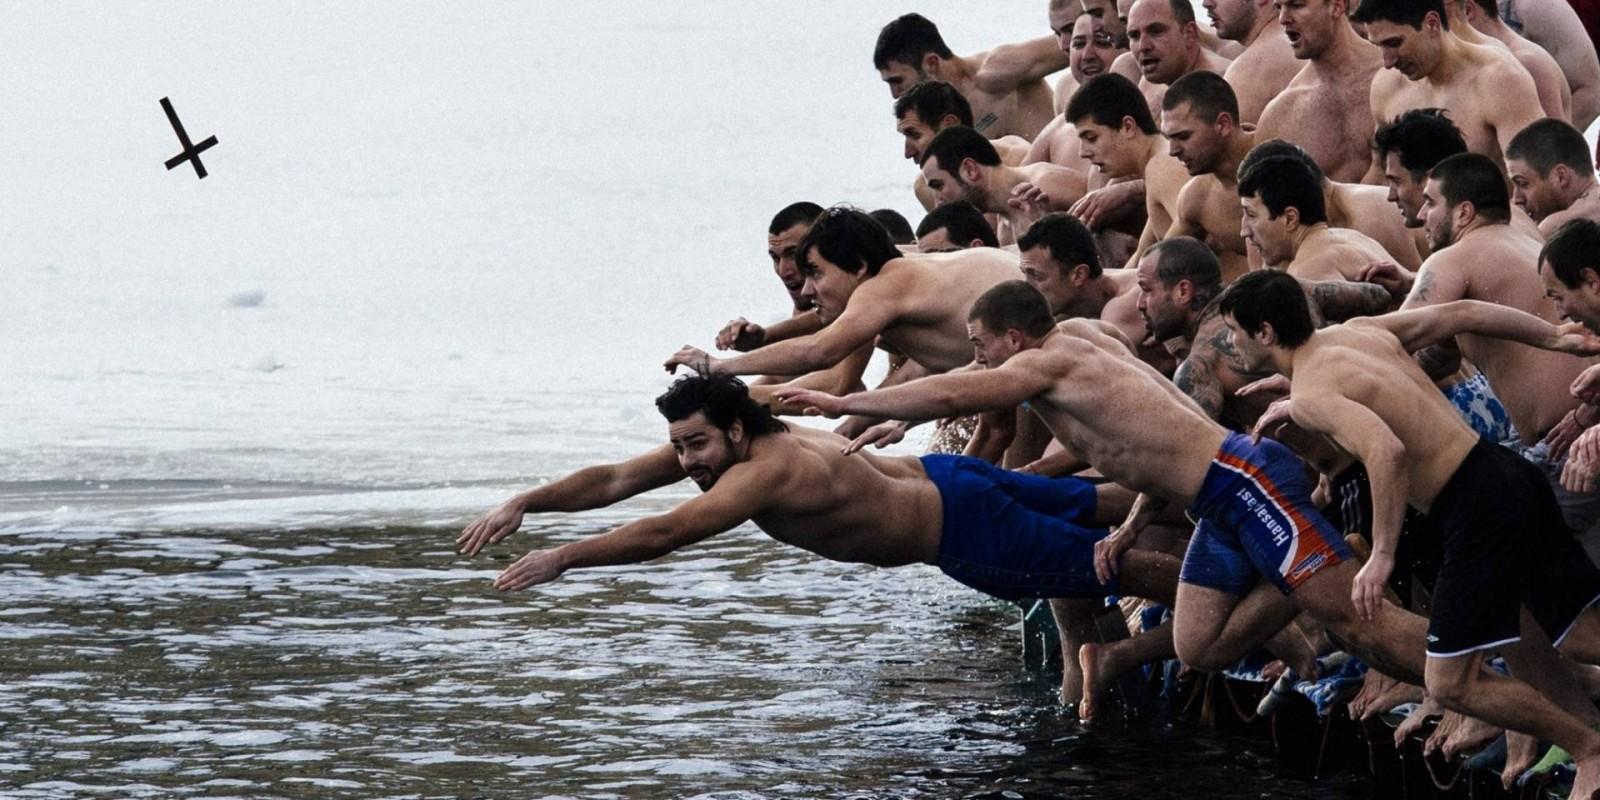 Greeks dive for cross